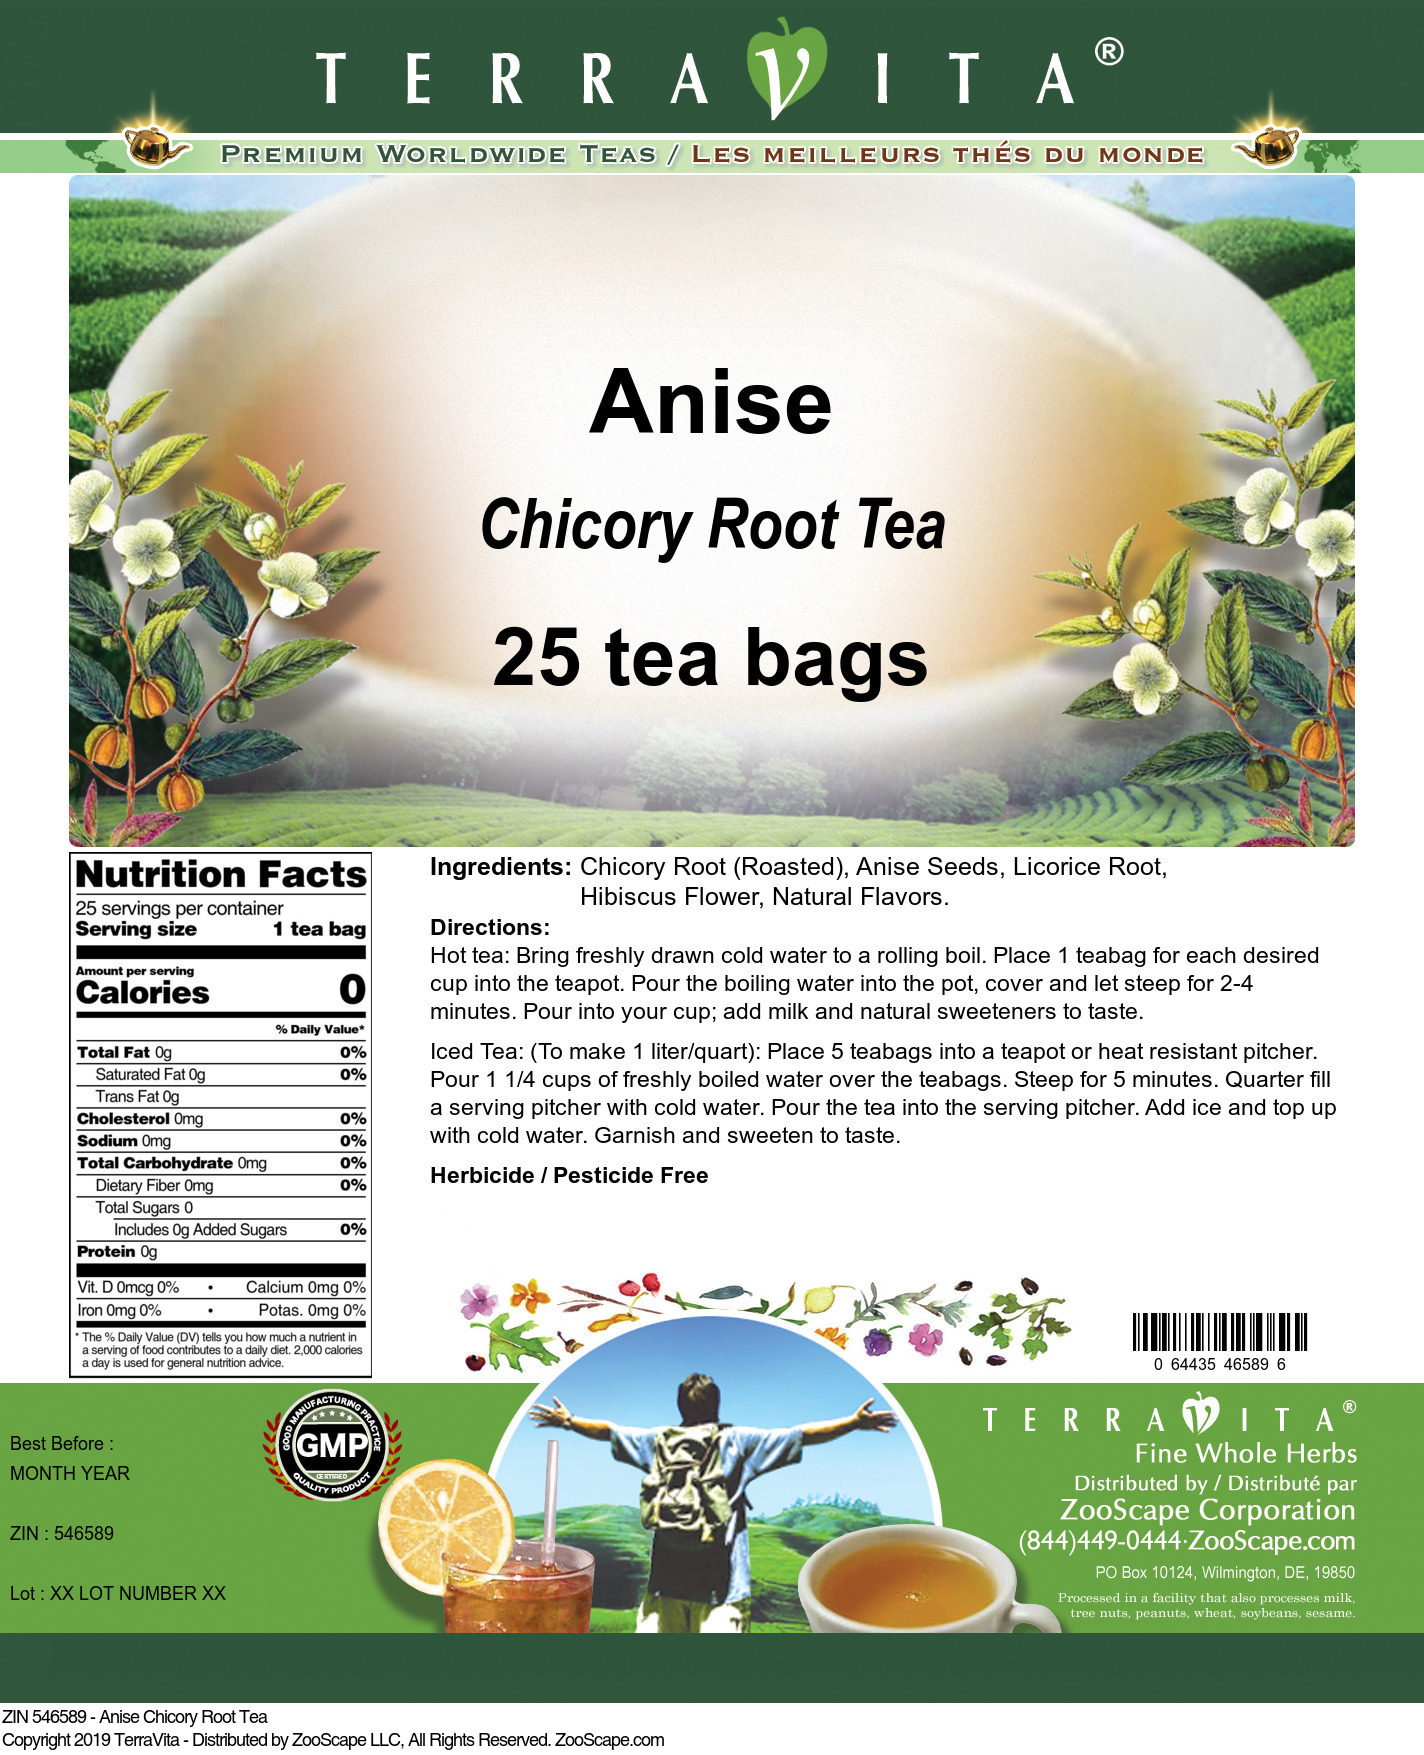 Anise Chicory Root Tea